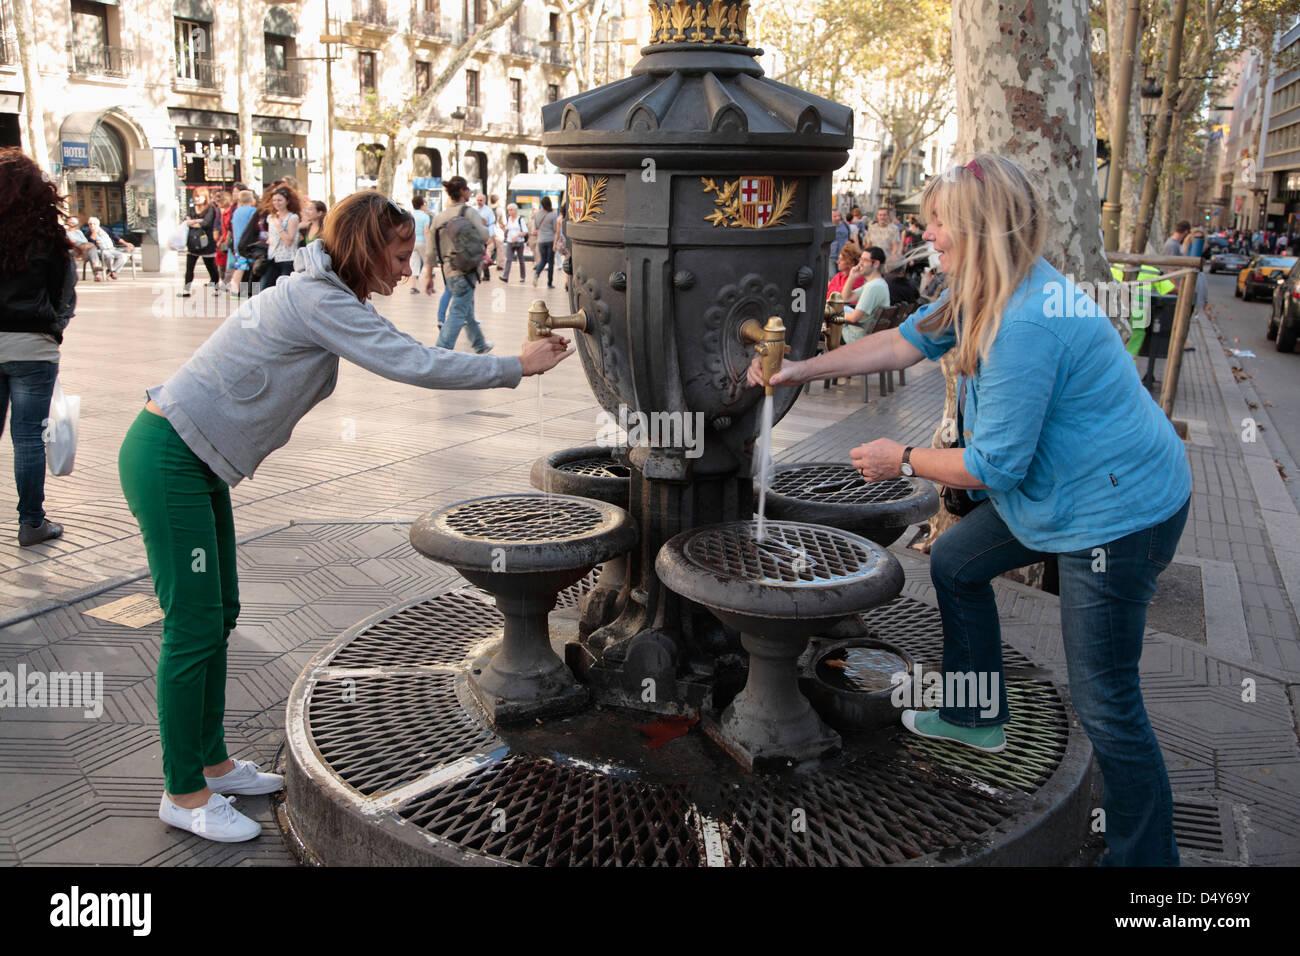 Fountain at Rambla de Canaletes, Barcelona, Spain - Stock Image